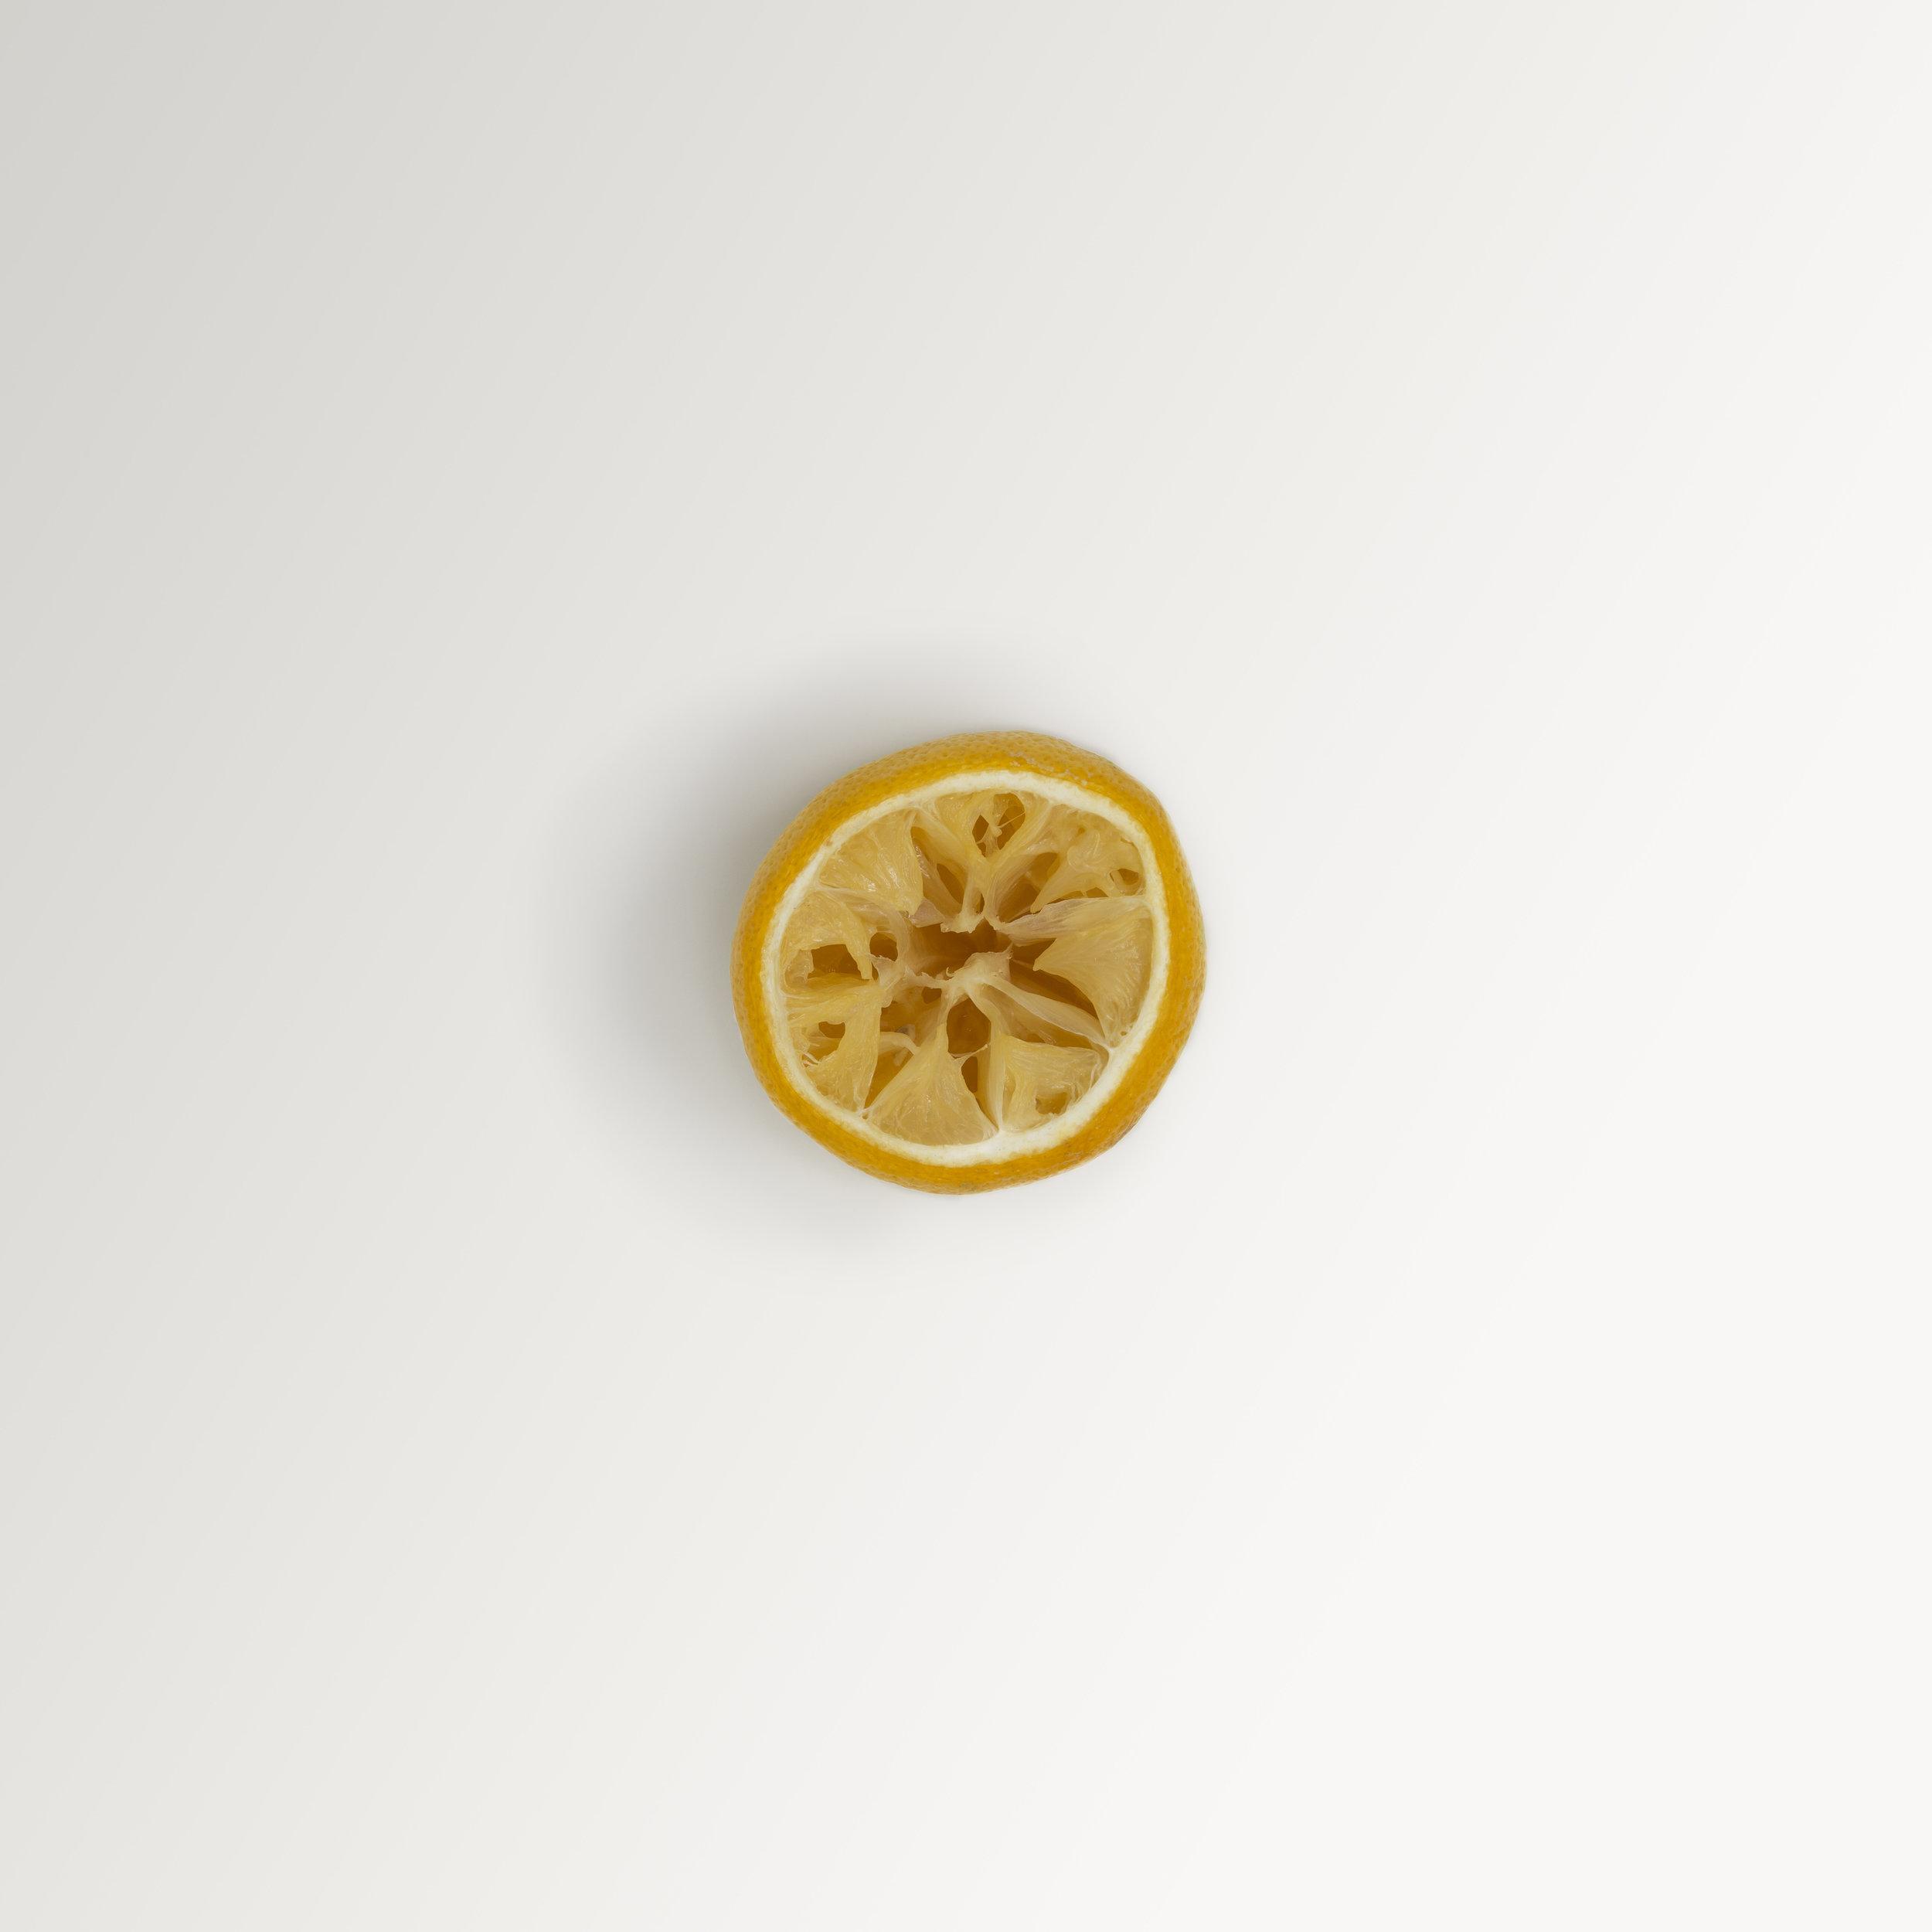 A simple, minimalist, contemporary, fine art photograph of a lemon